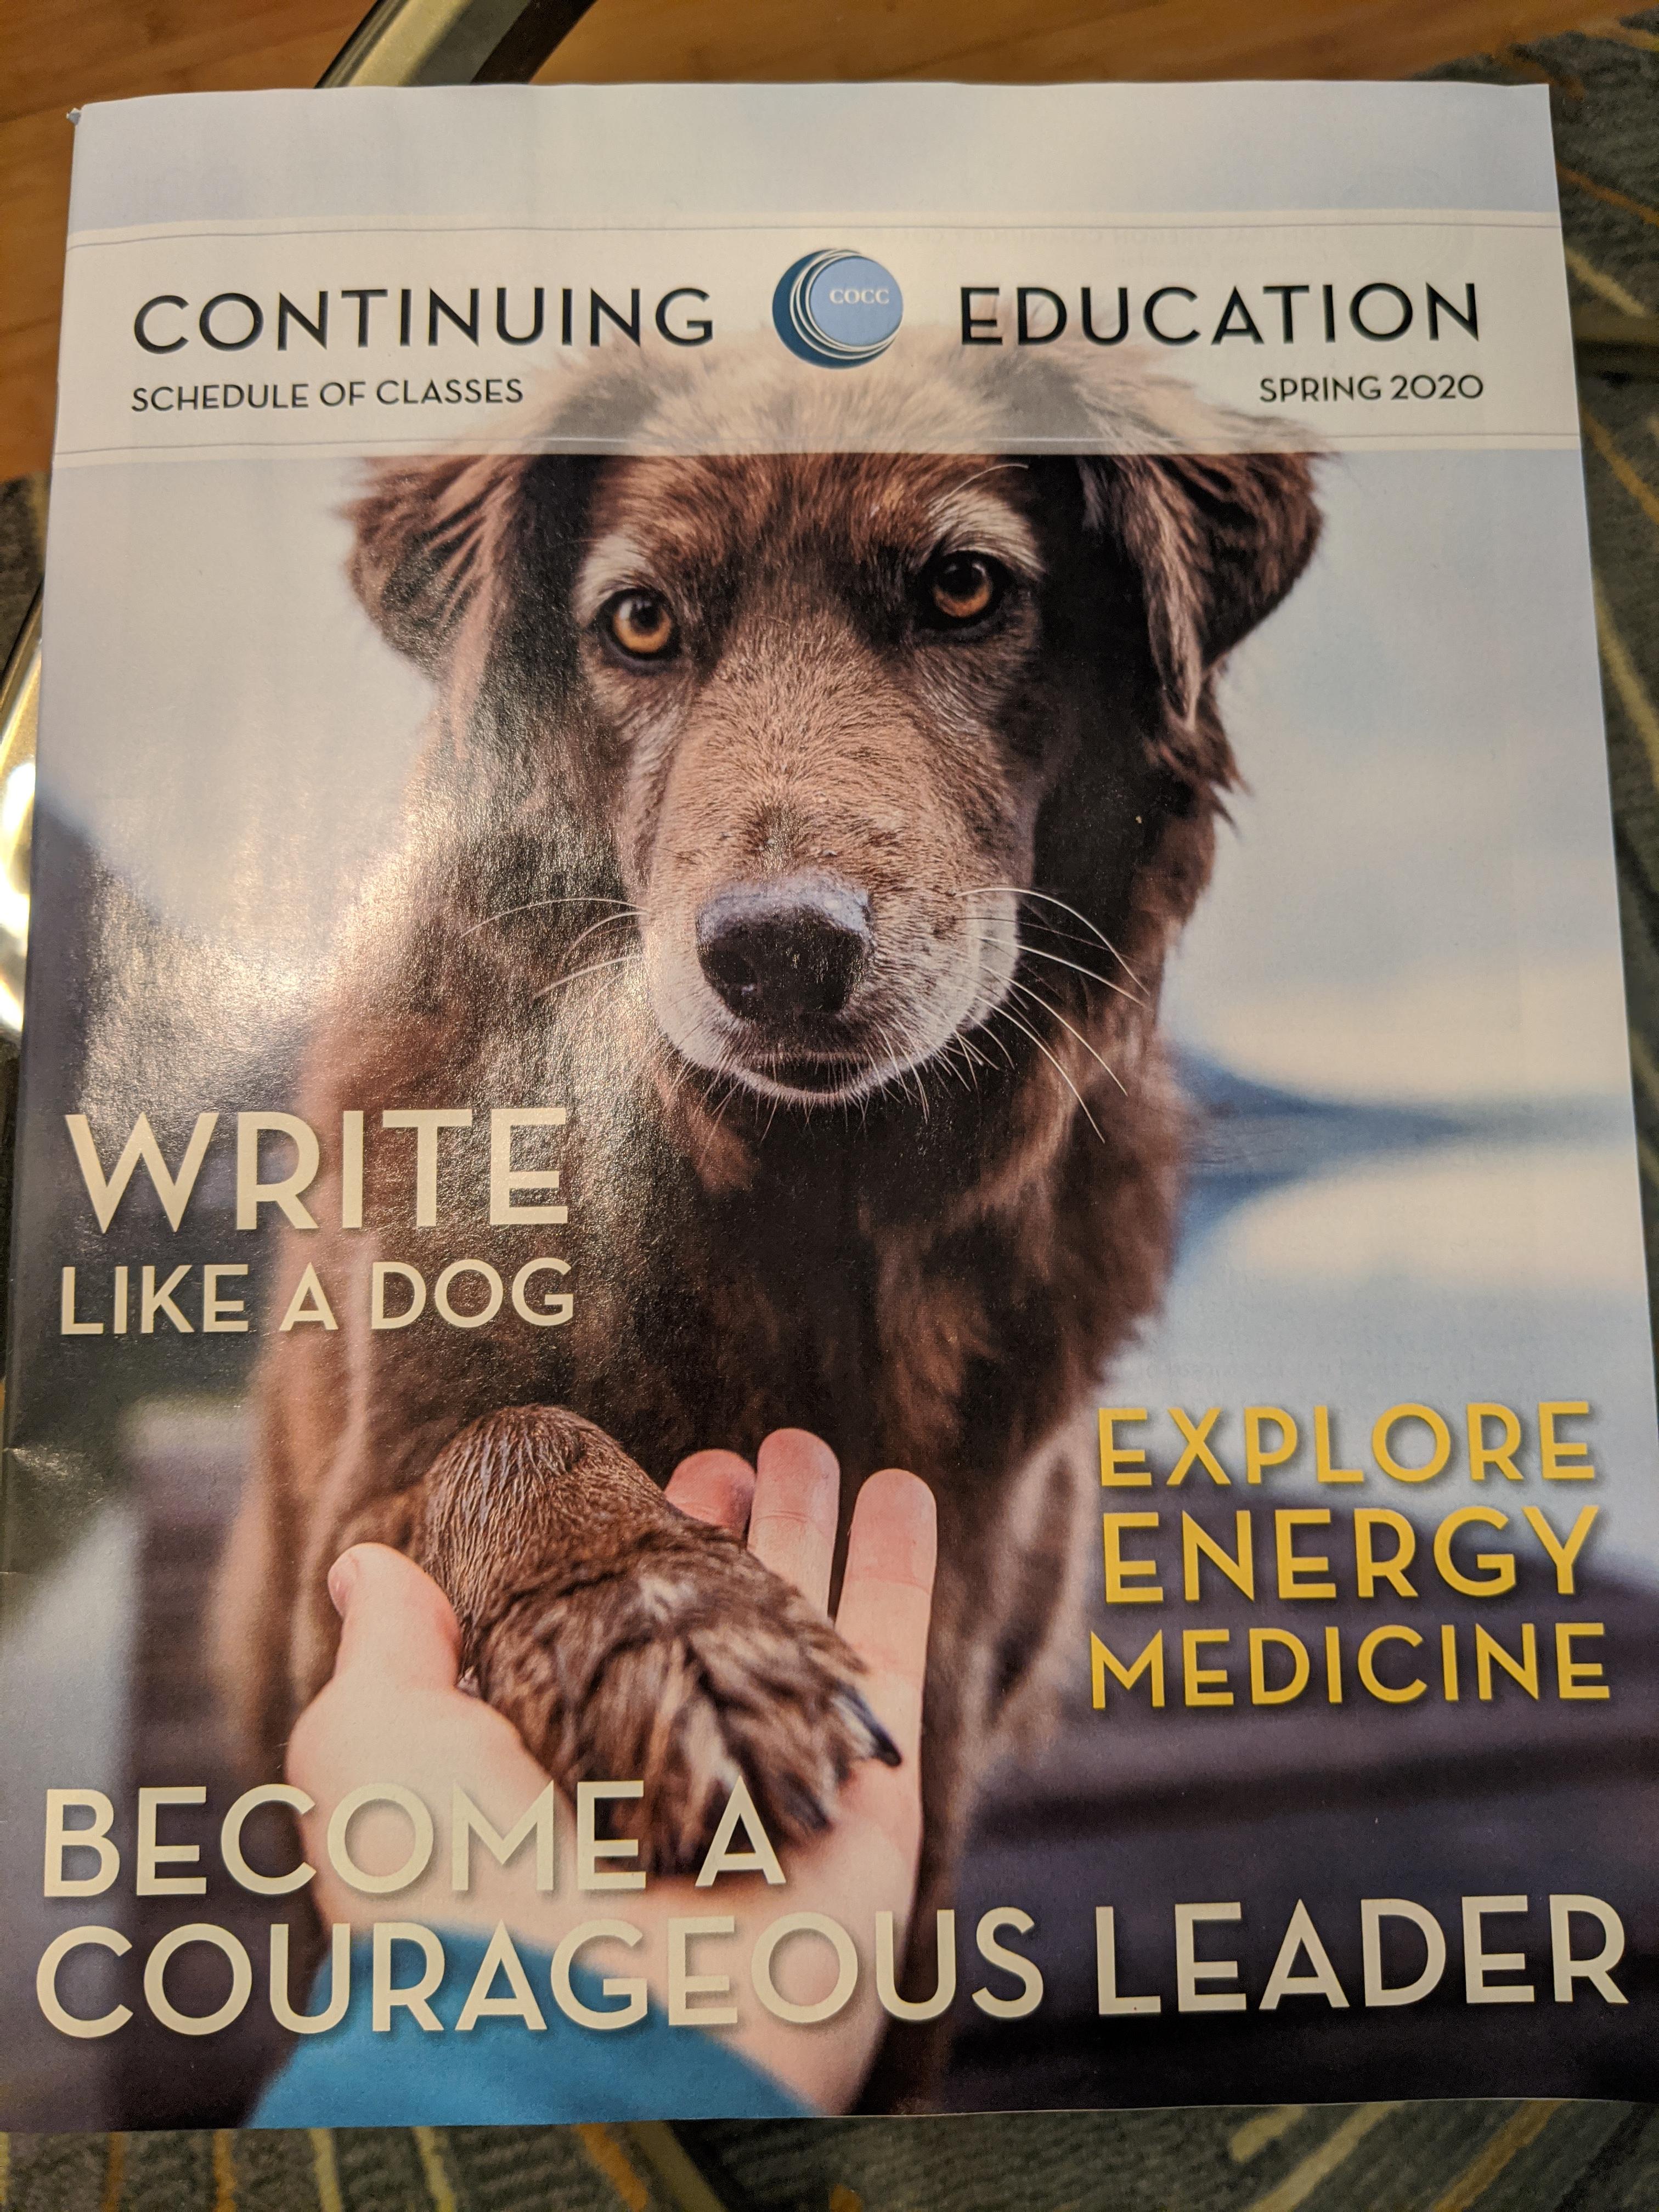 COCC brochure